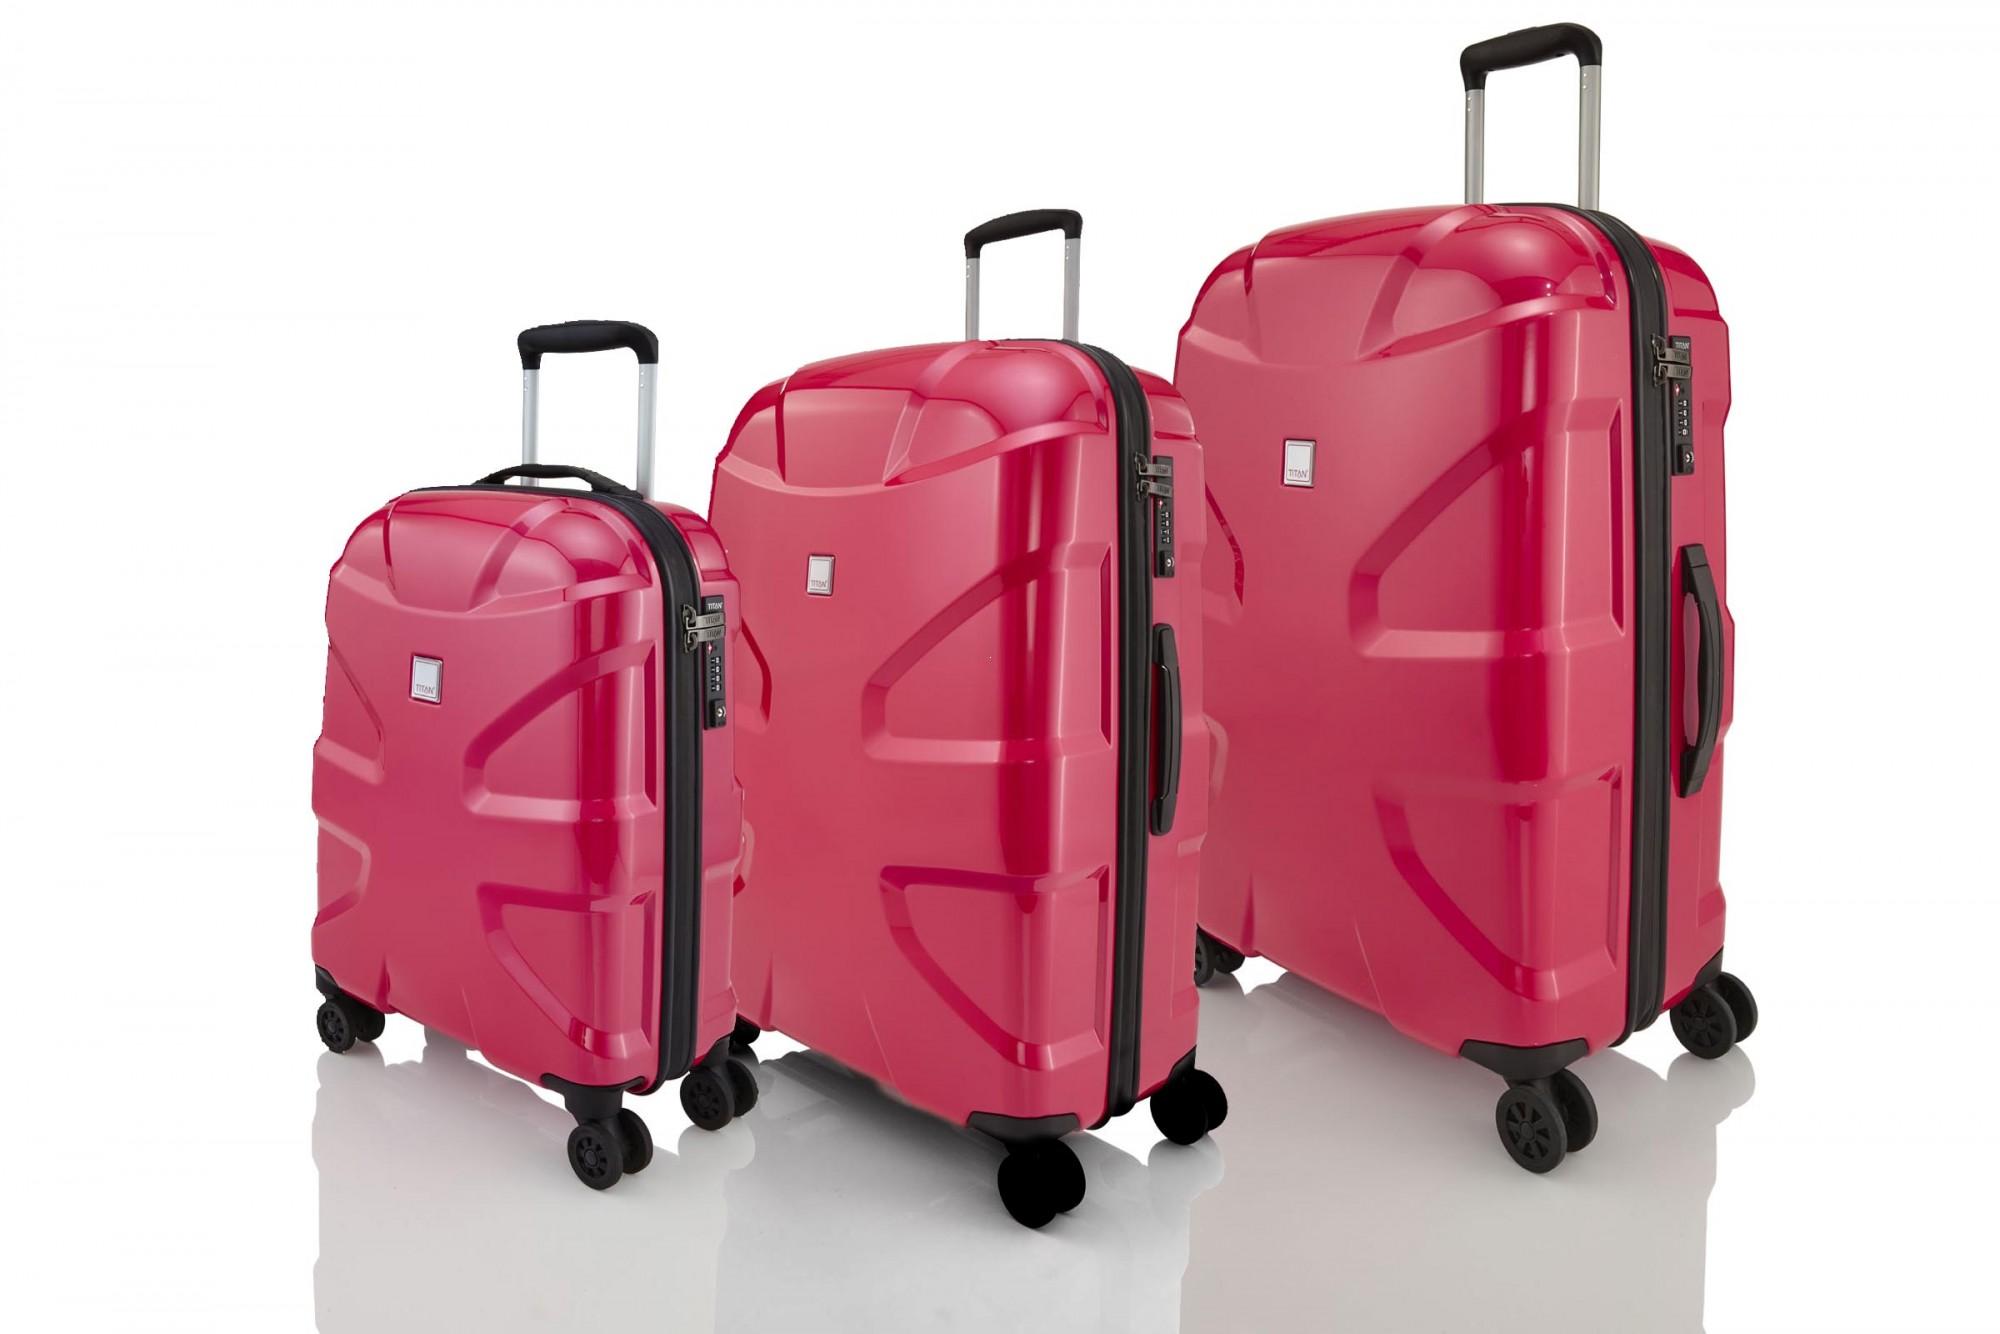 d2b5e0d4e0900 Komplet walizek marki Titan z kolekcji X2 Flash, poliwęglan, 4 kółka ...